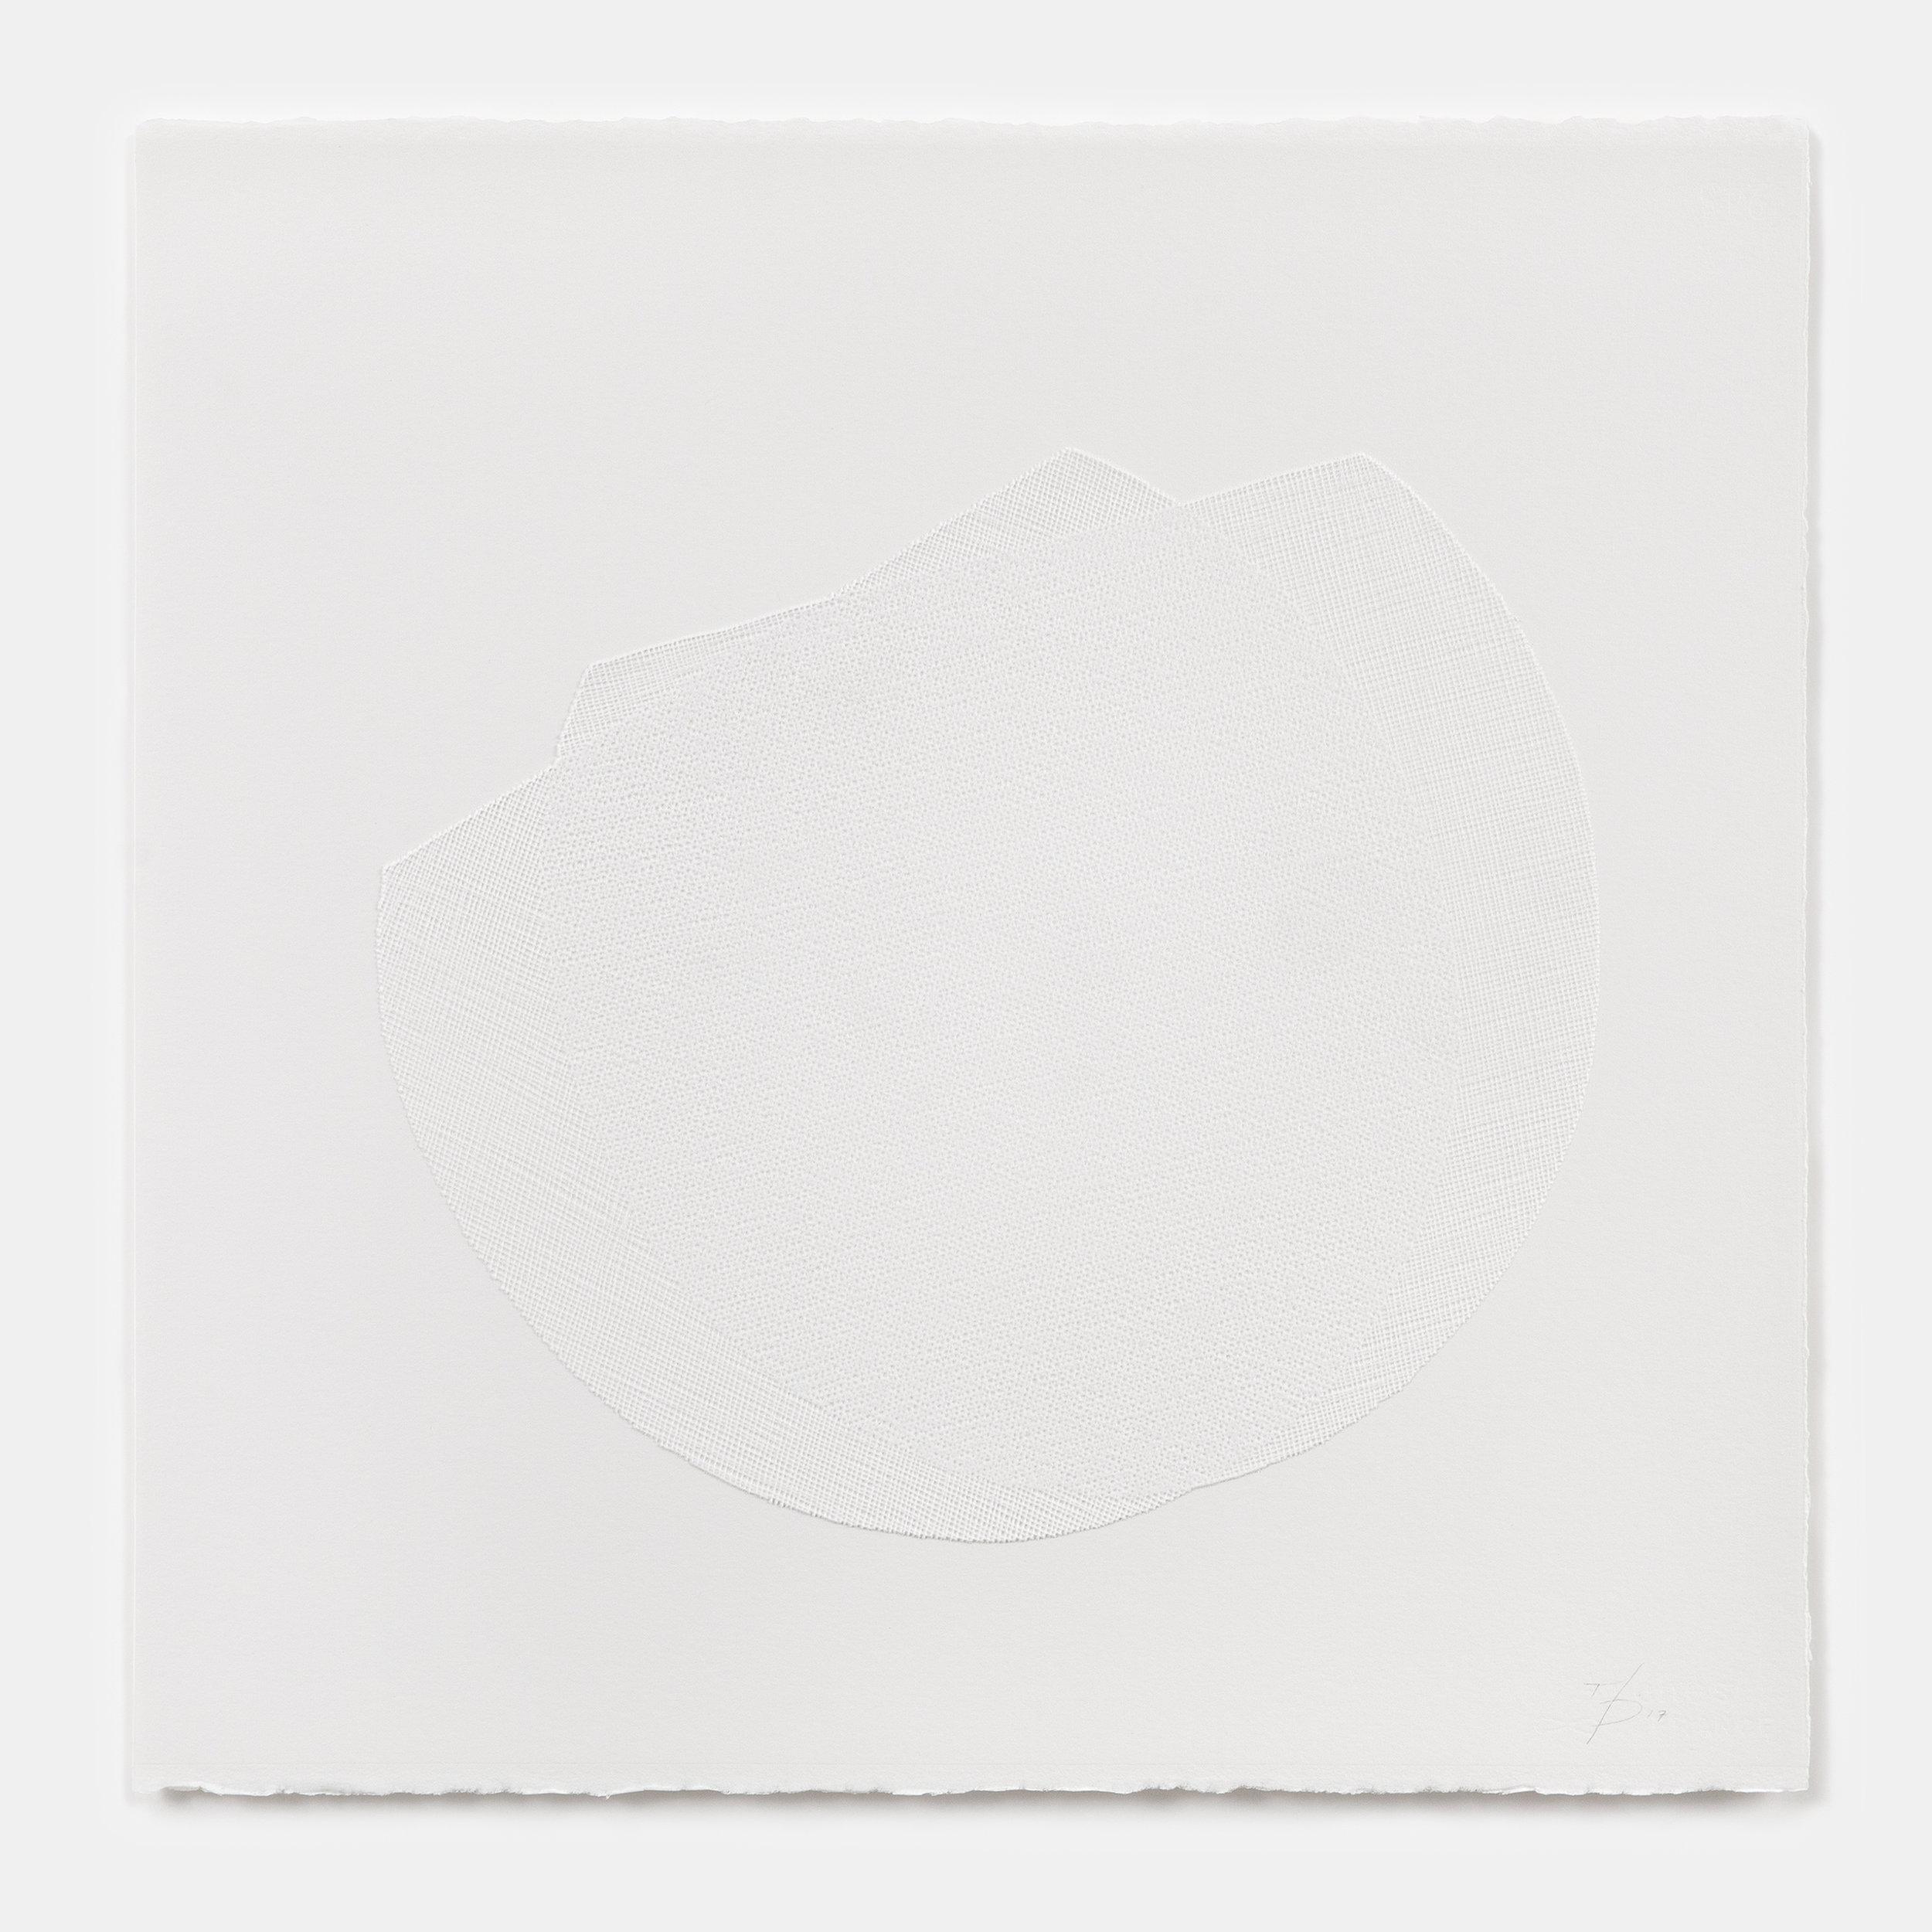 Mel Douglas, liminal III, 2017,fused glass, paper, 60 x 60 cm.Photos: David Paterson.